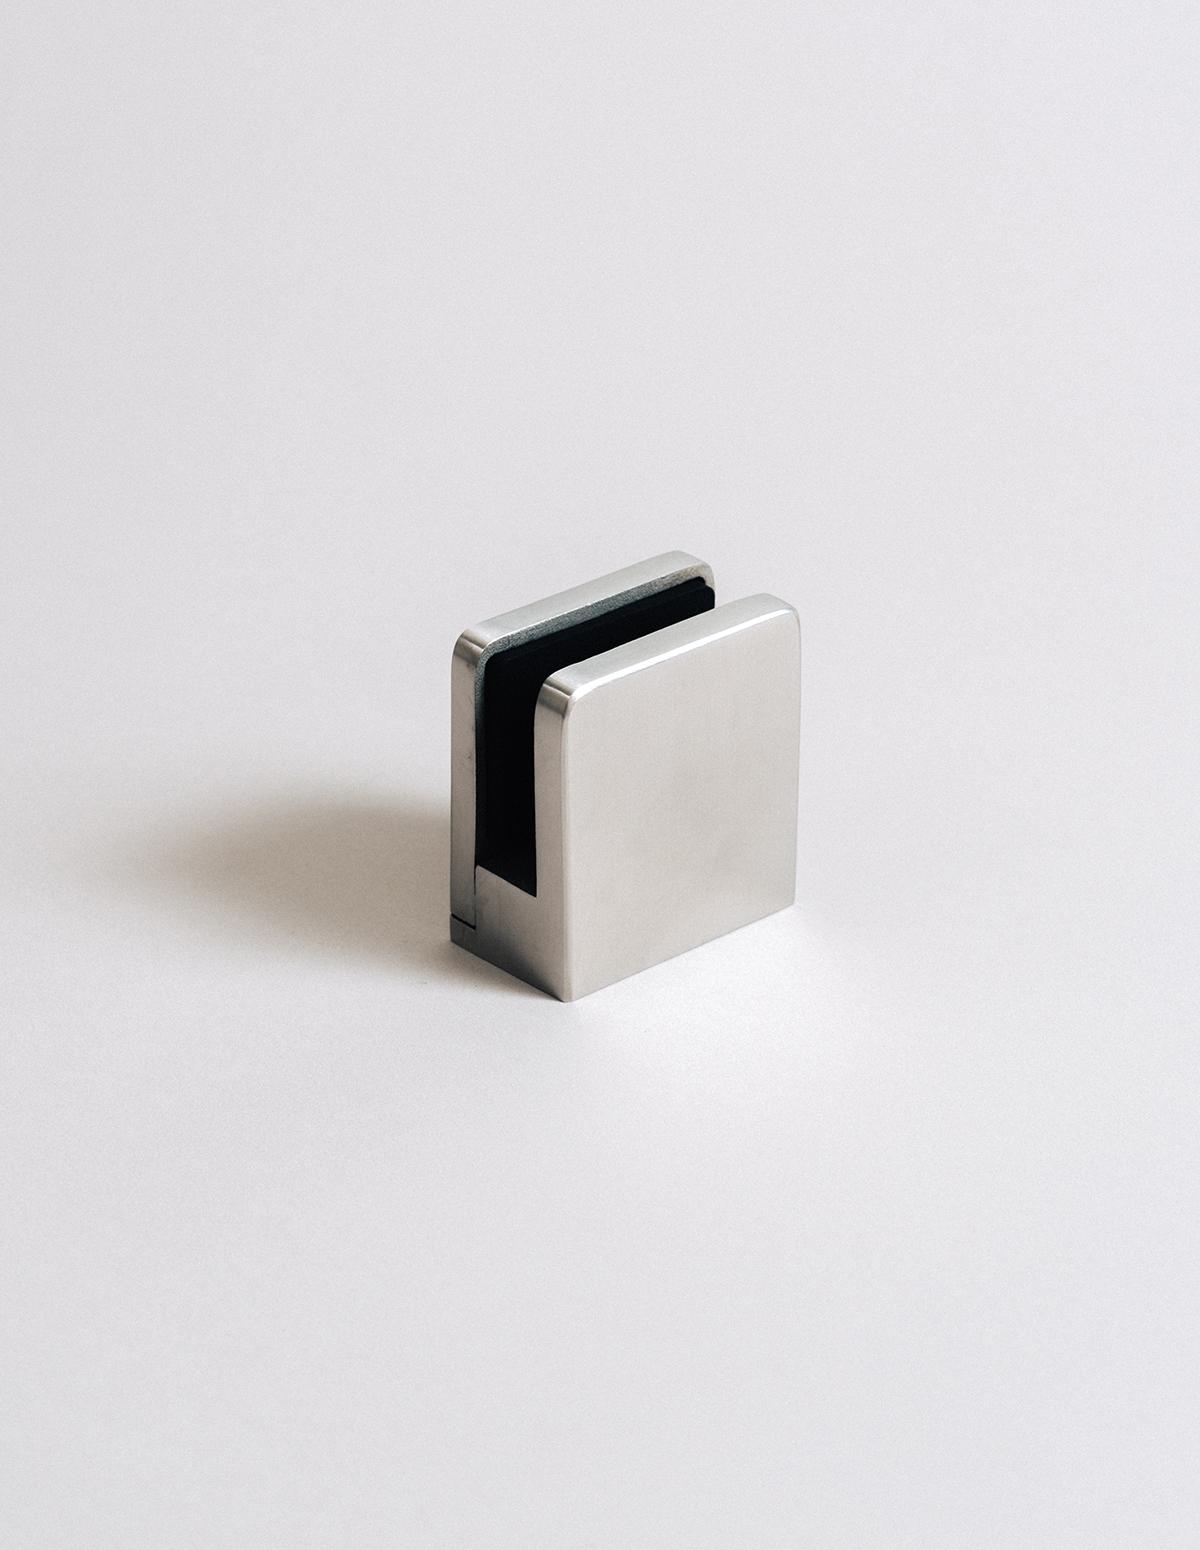 Optimum-Studios-Architectural-Glass-Metal-HardwarePage-GlassClip5-042216